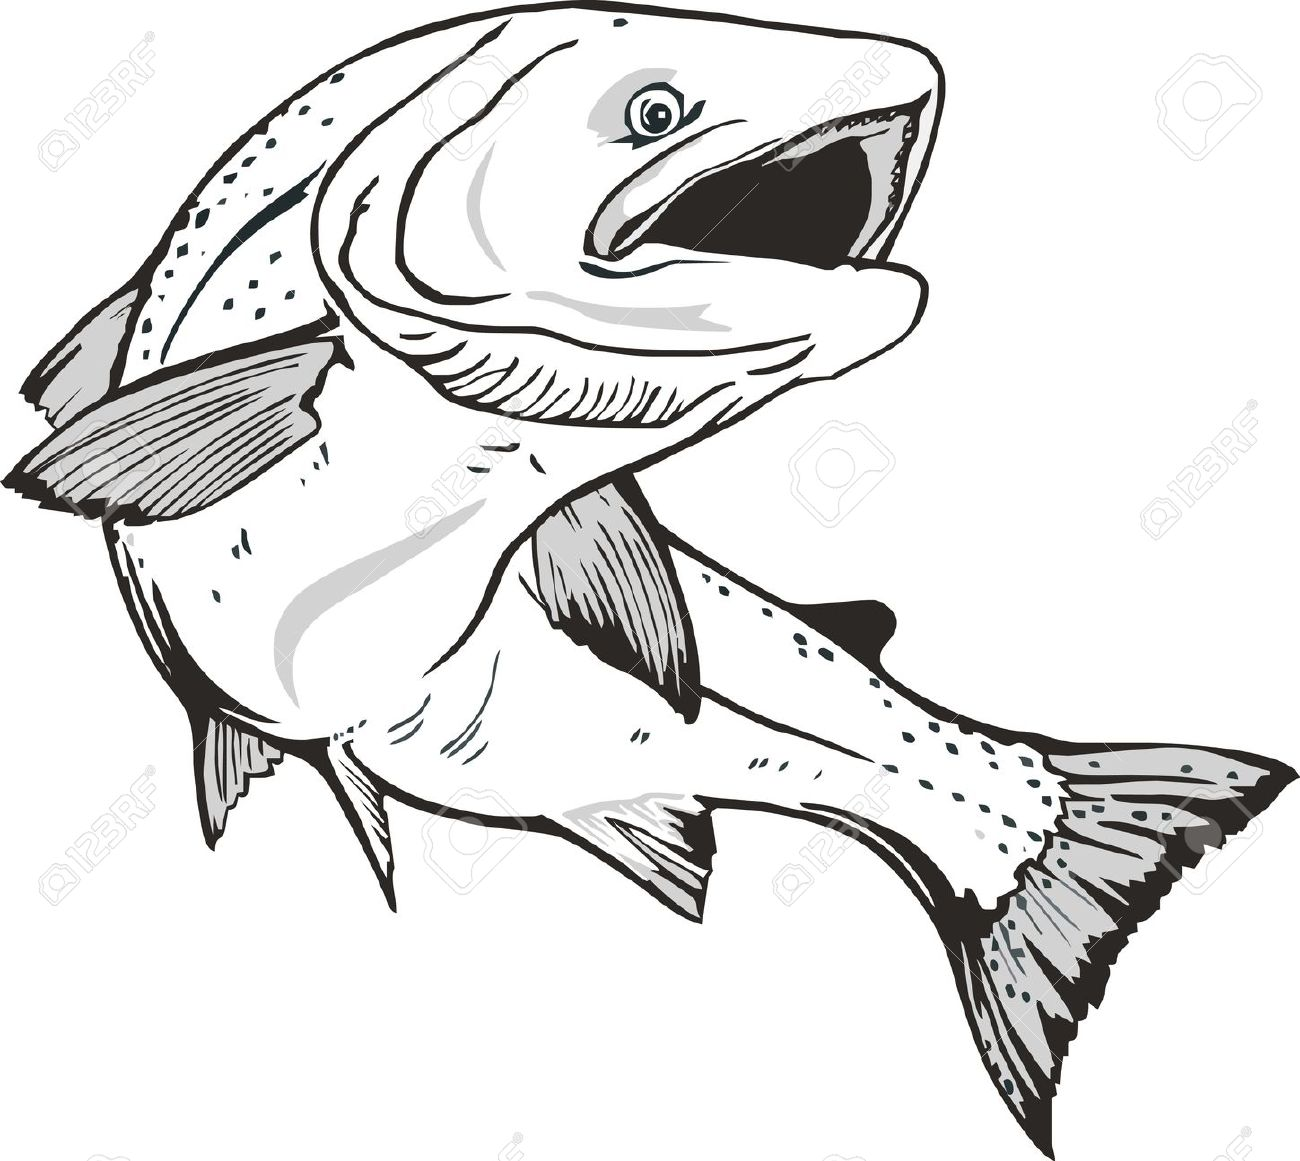 Salmon fish clipart free picture stock salmon: Salmon fish | Clipart Panda - Free Clipart Images picture stock